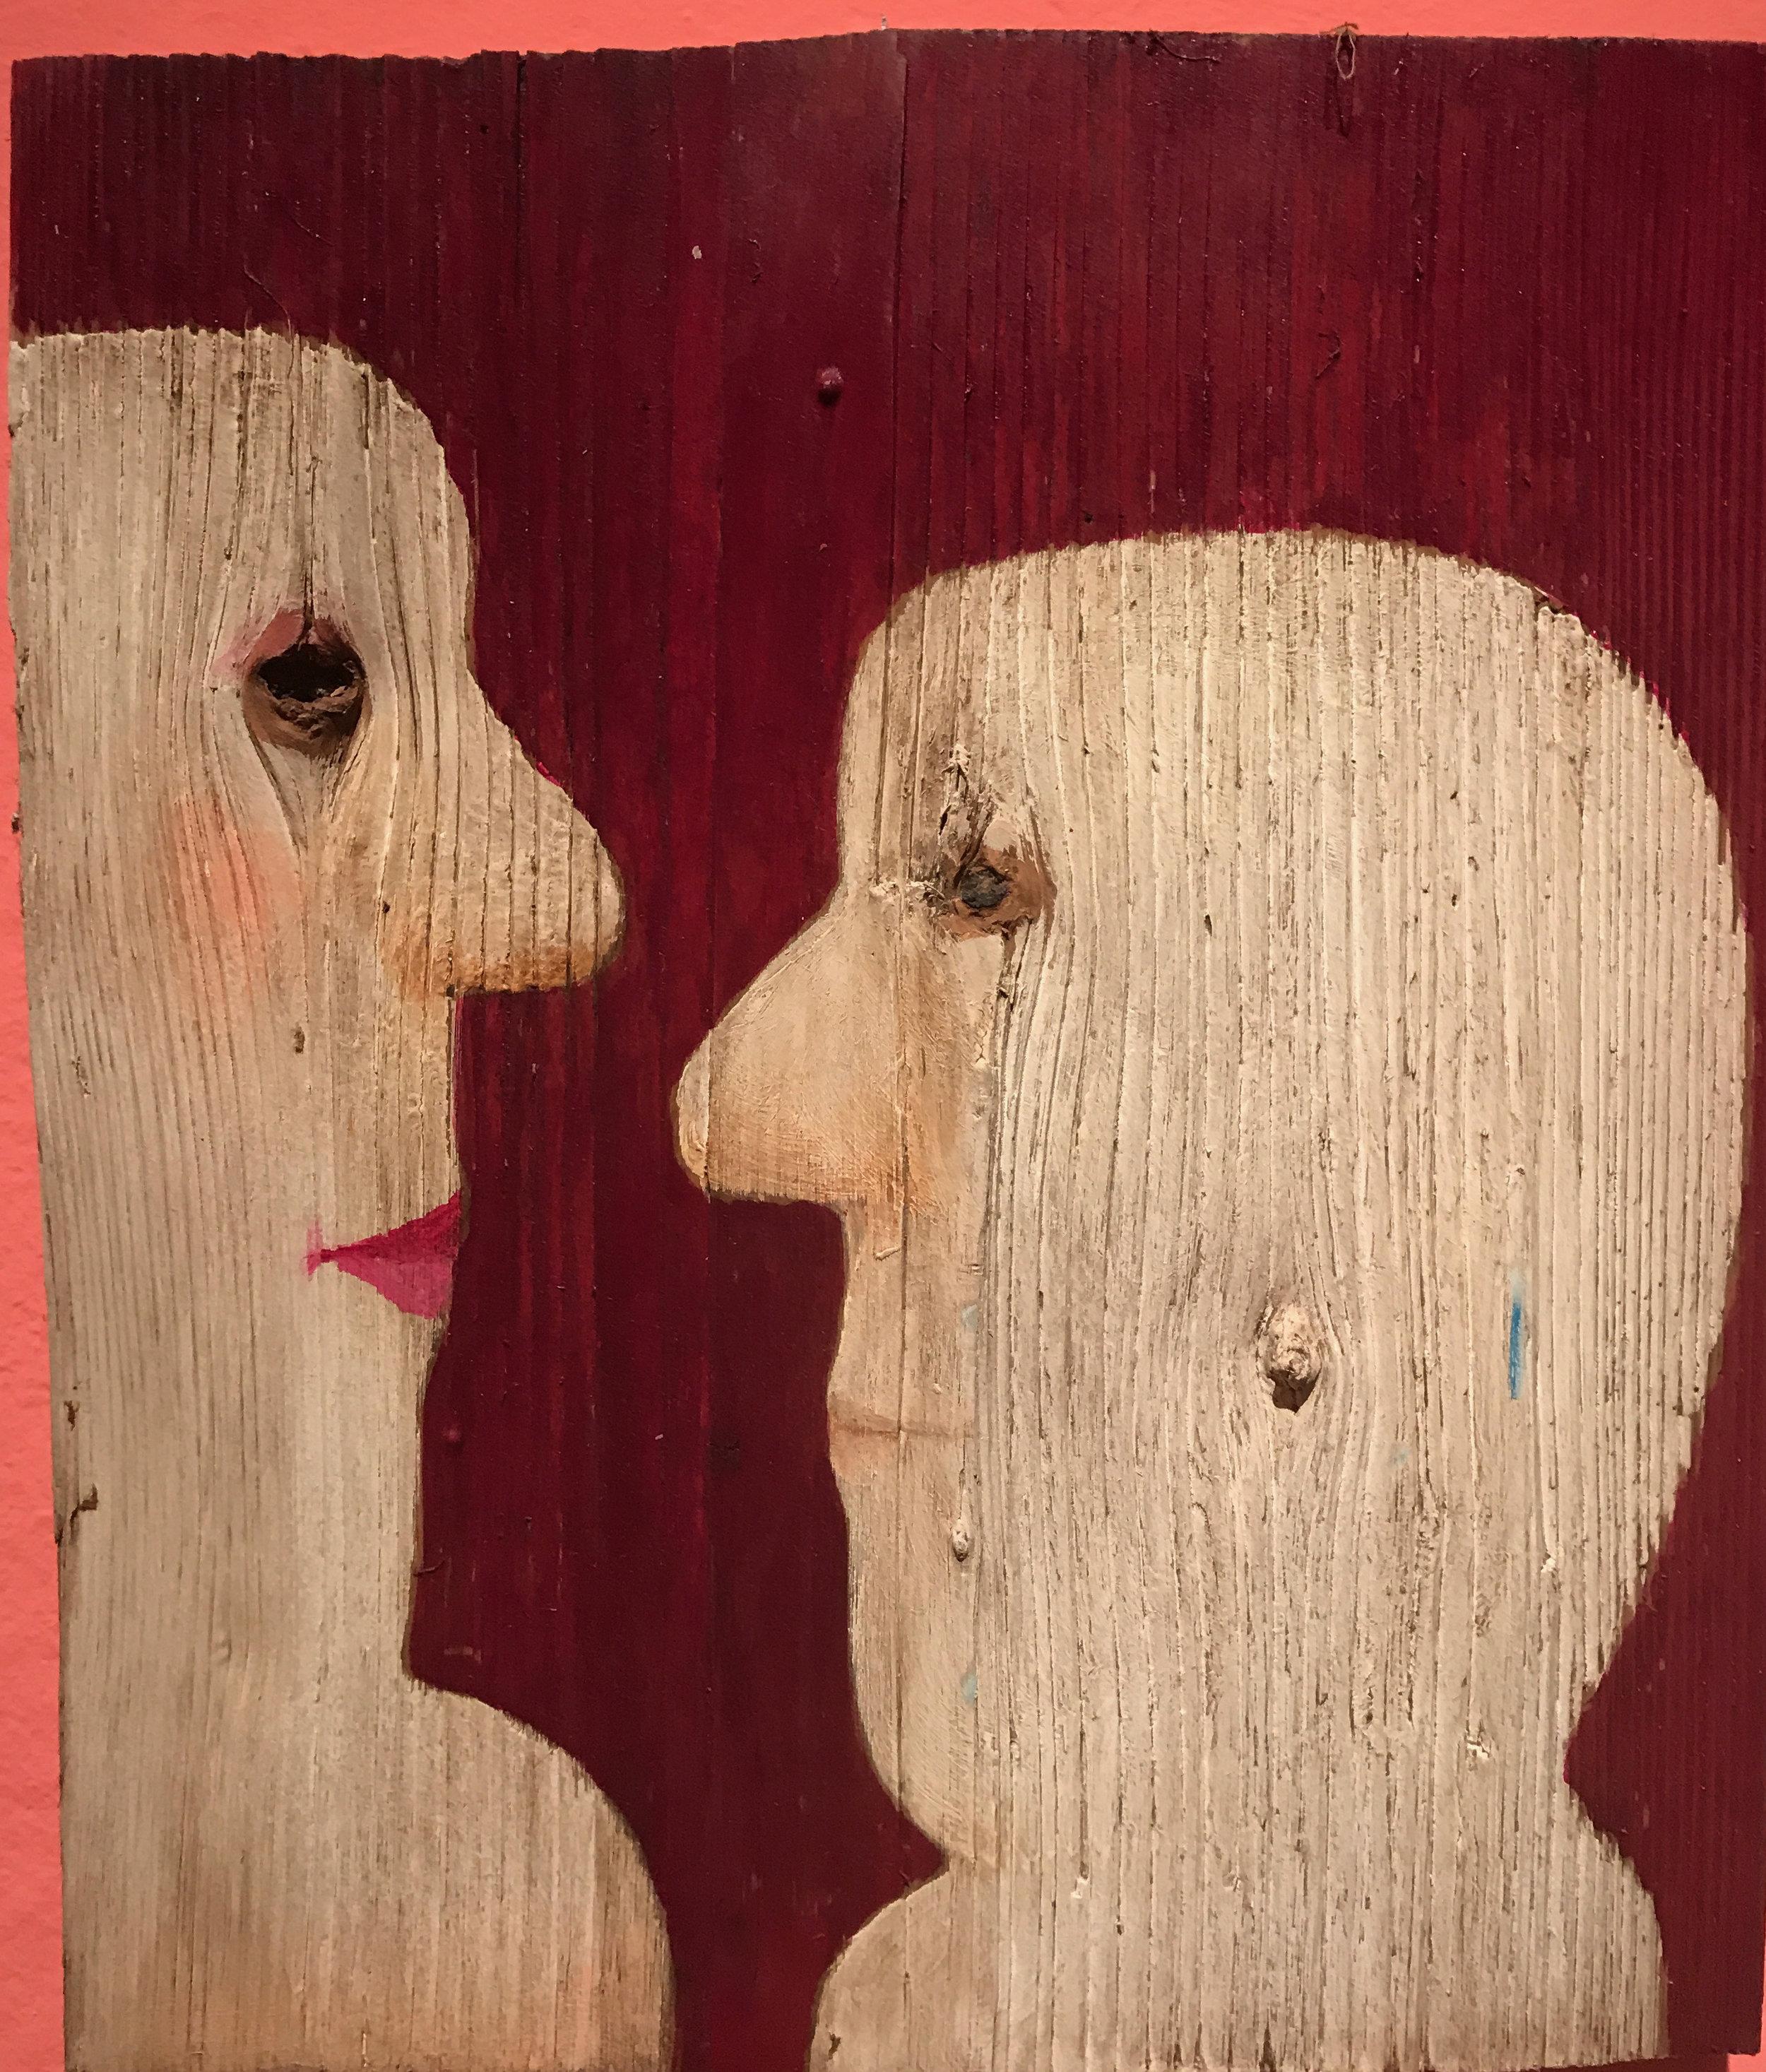 acrylic on wood, Vasko Lipovac